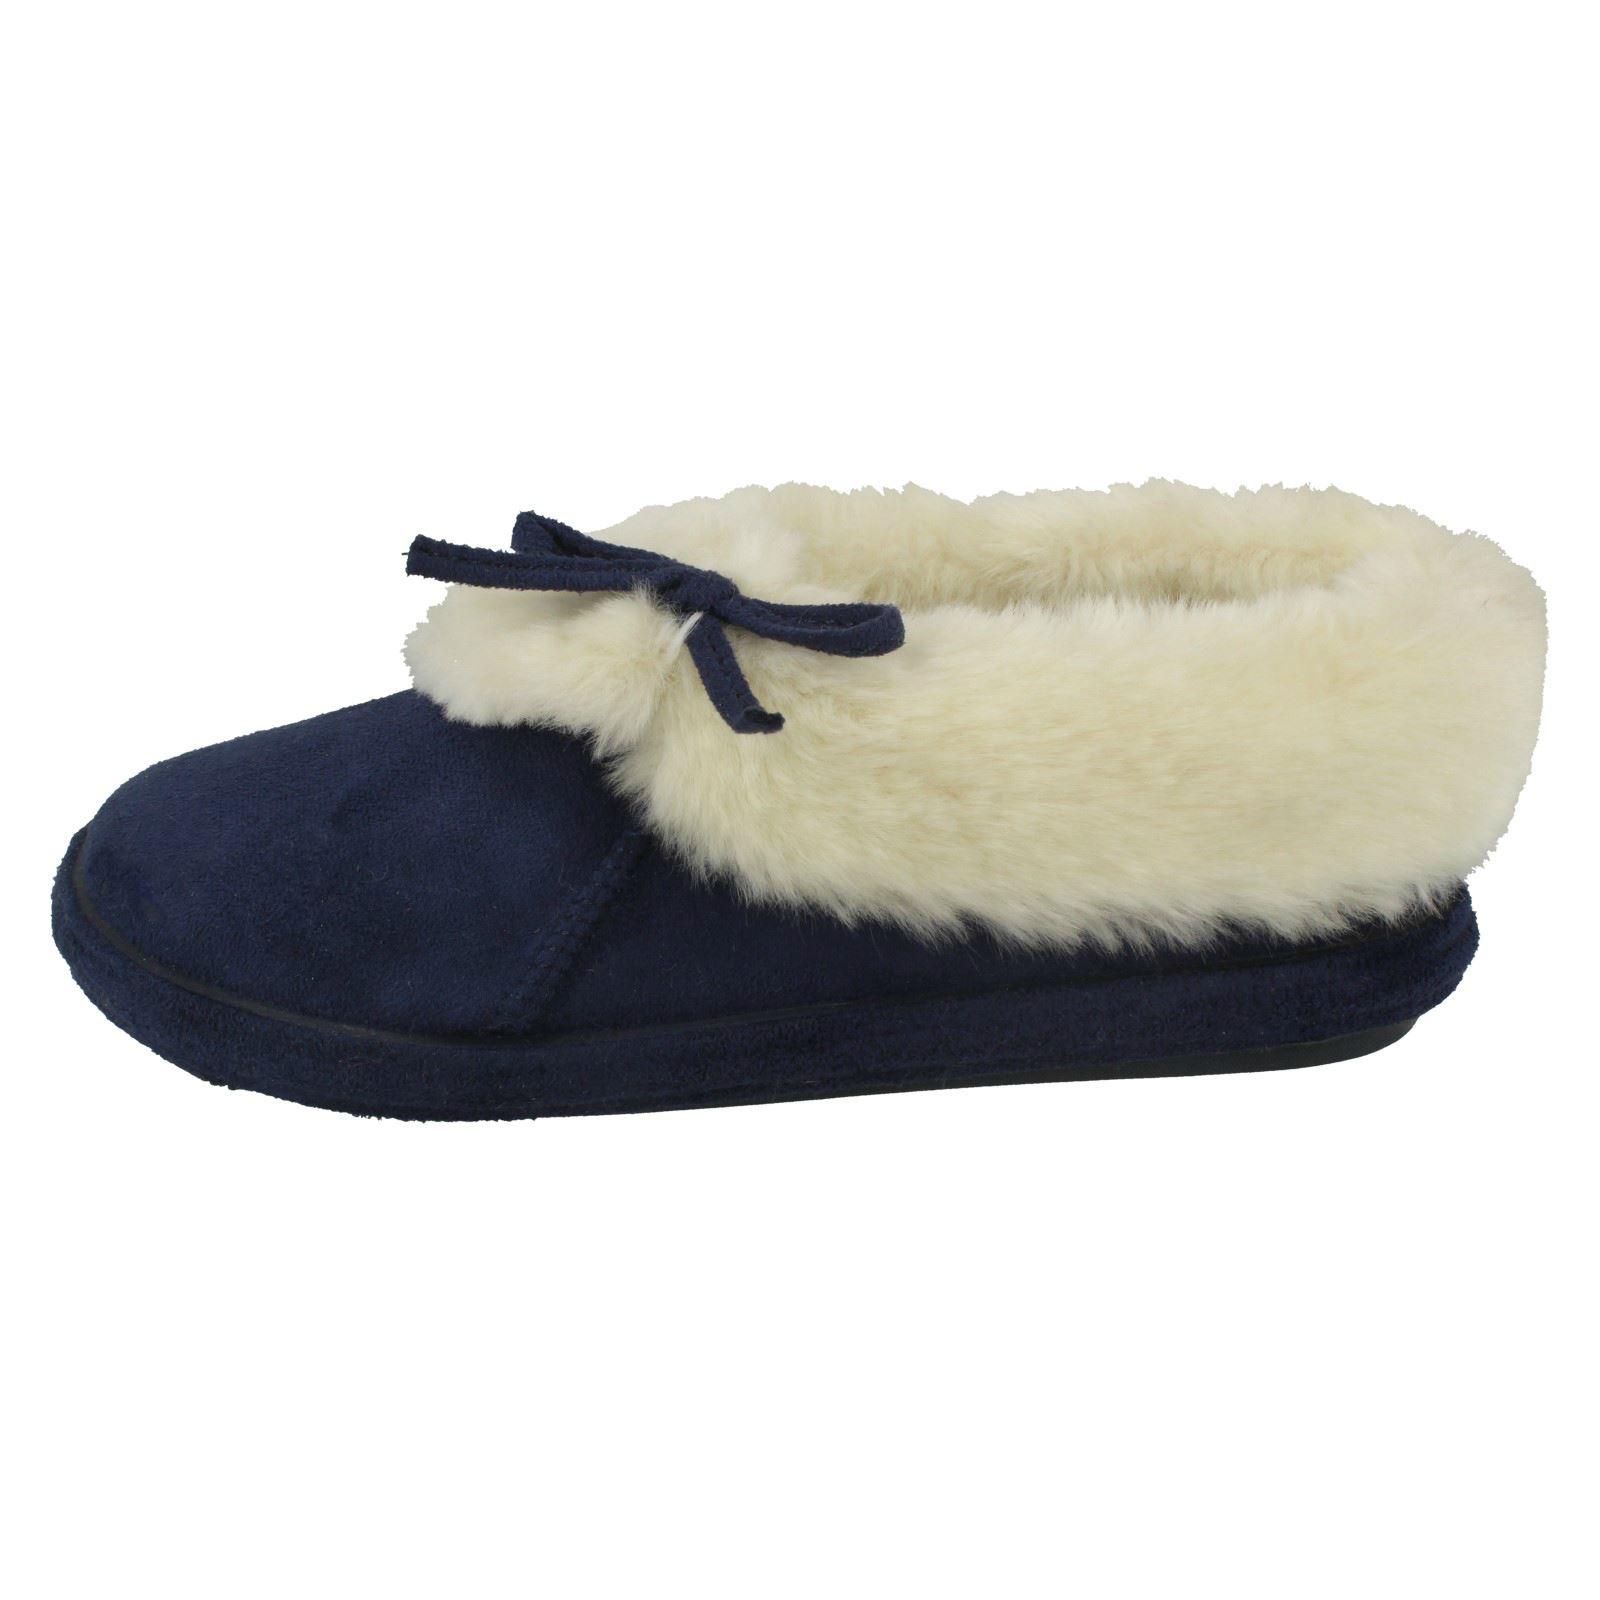 Ladies Jyoti Fur Lined Textile Slippers with Bow Detail Kalinda